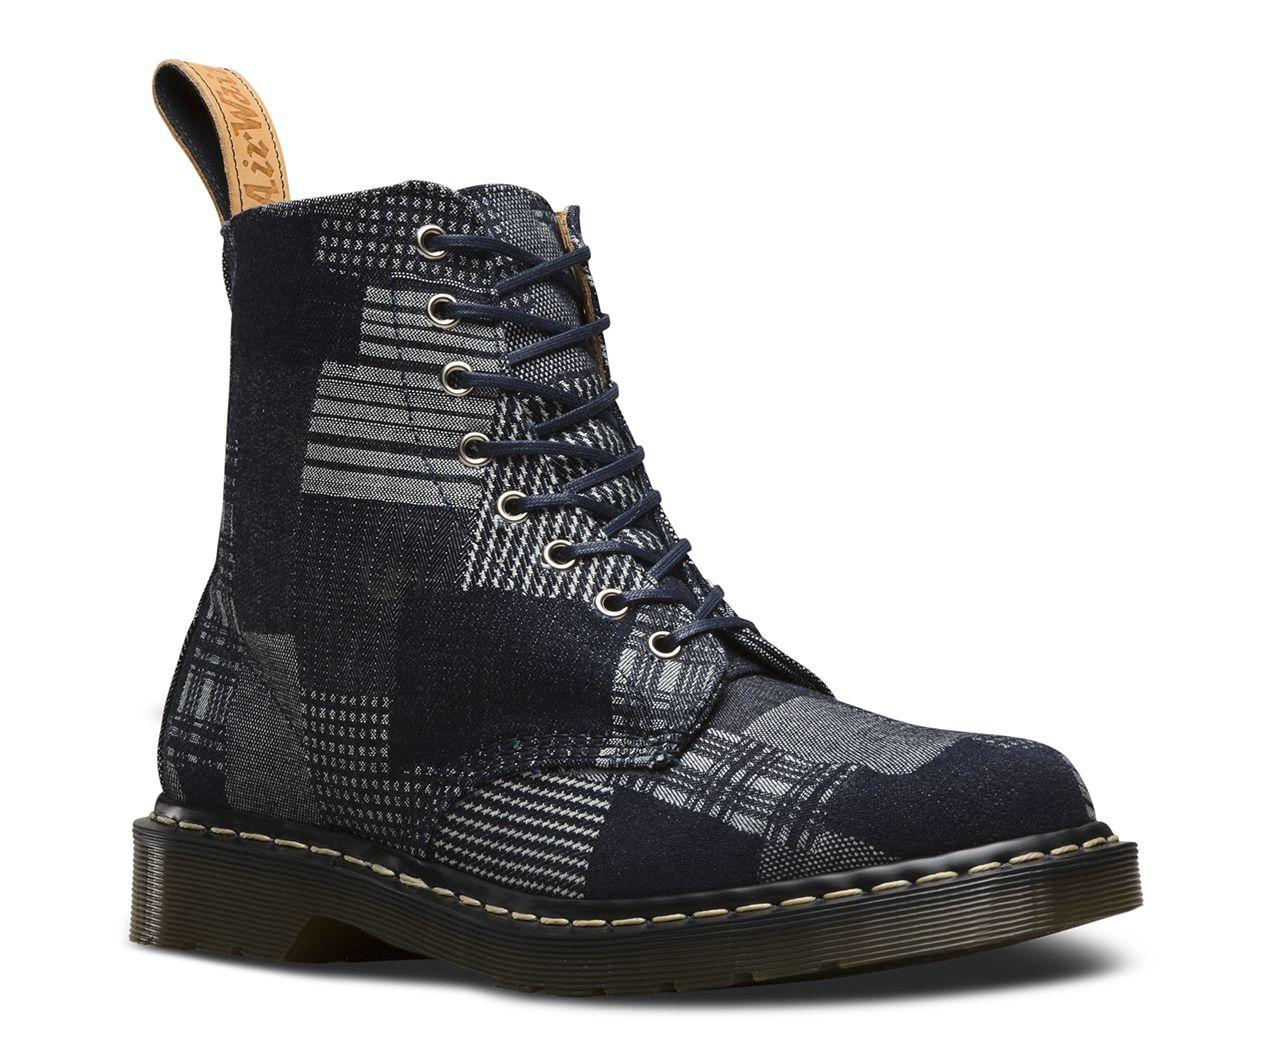 Vogue Retro Patterns Men Boots Boots Black Smooth For Sport sneaker 1460 Dr Marten